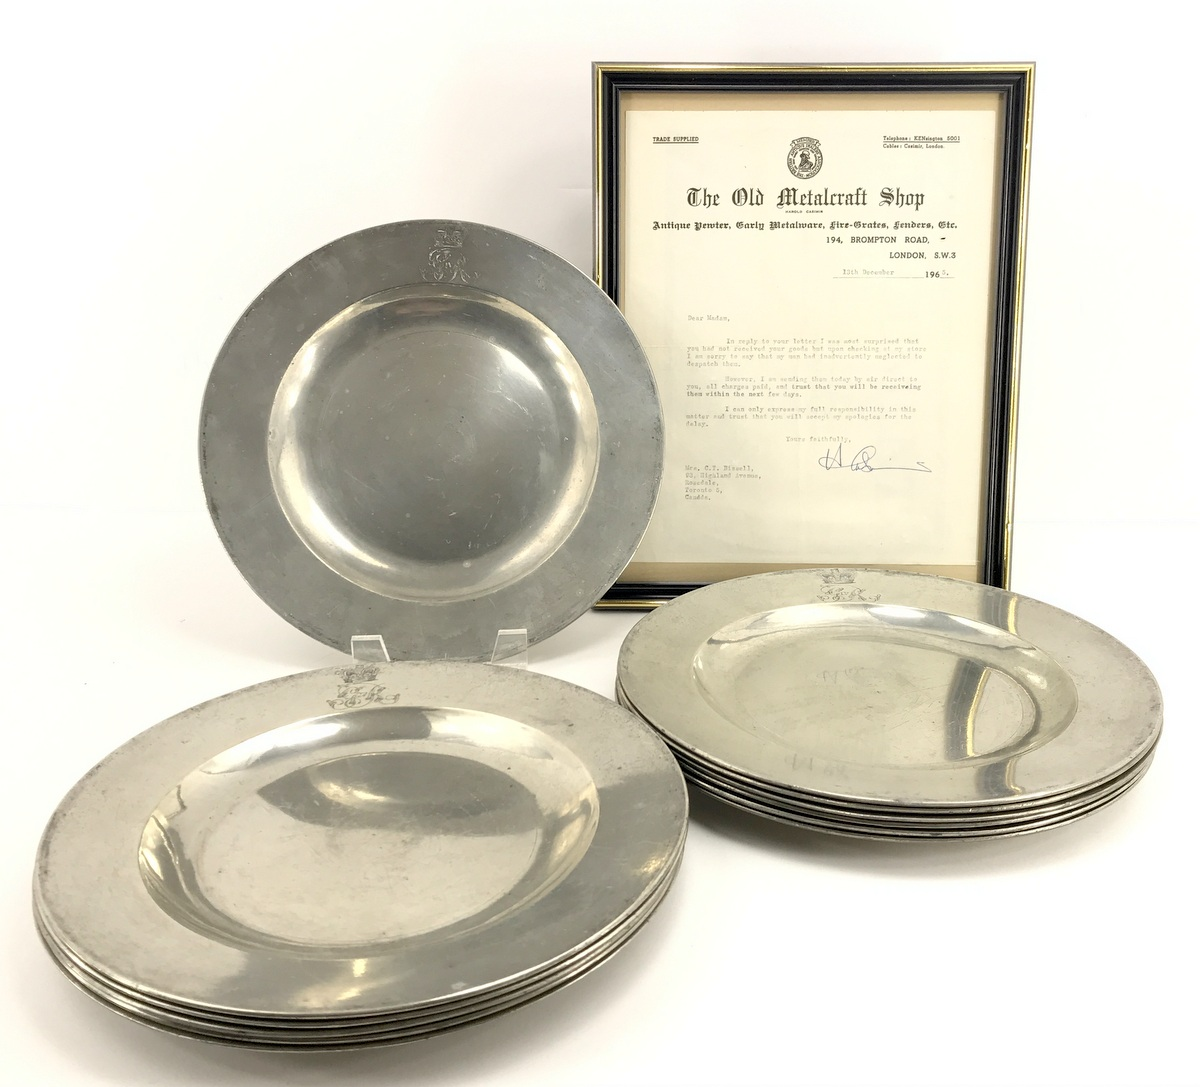 George IV Coronation Plates